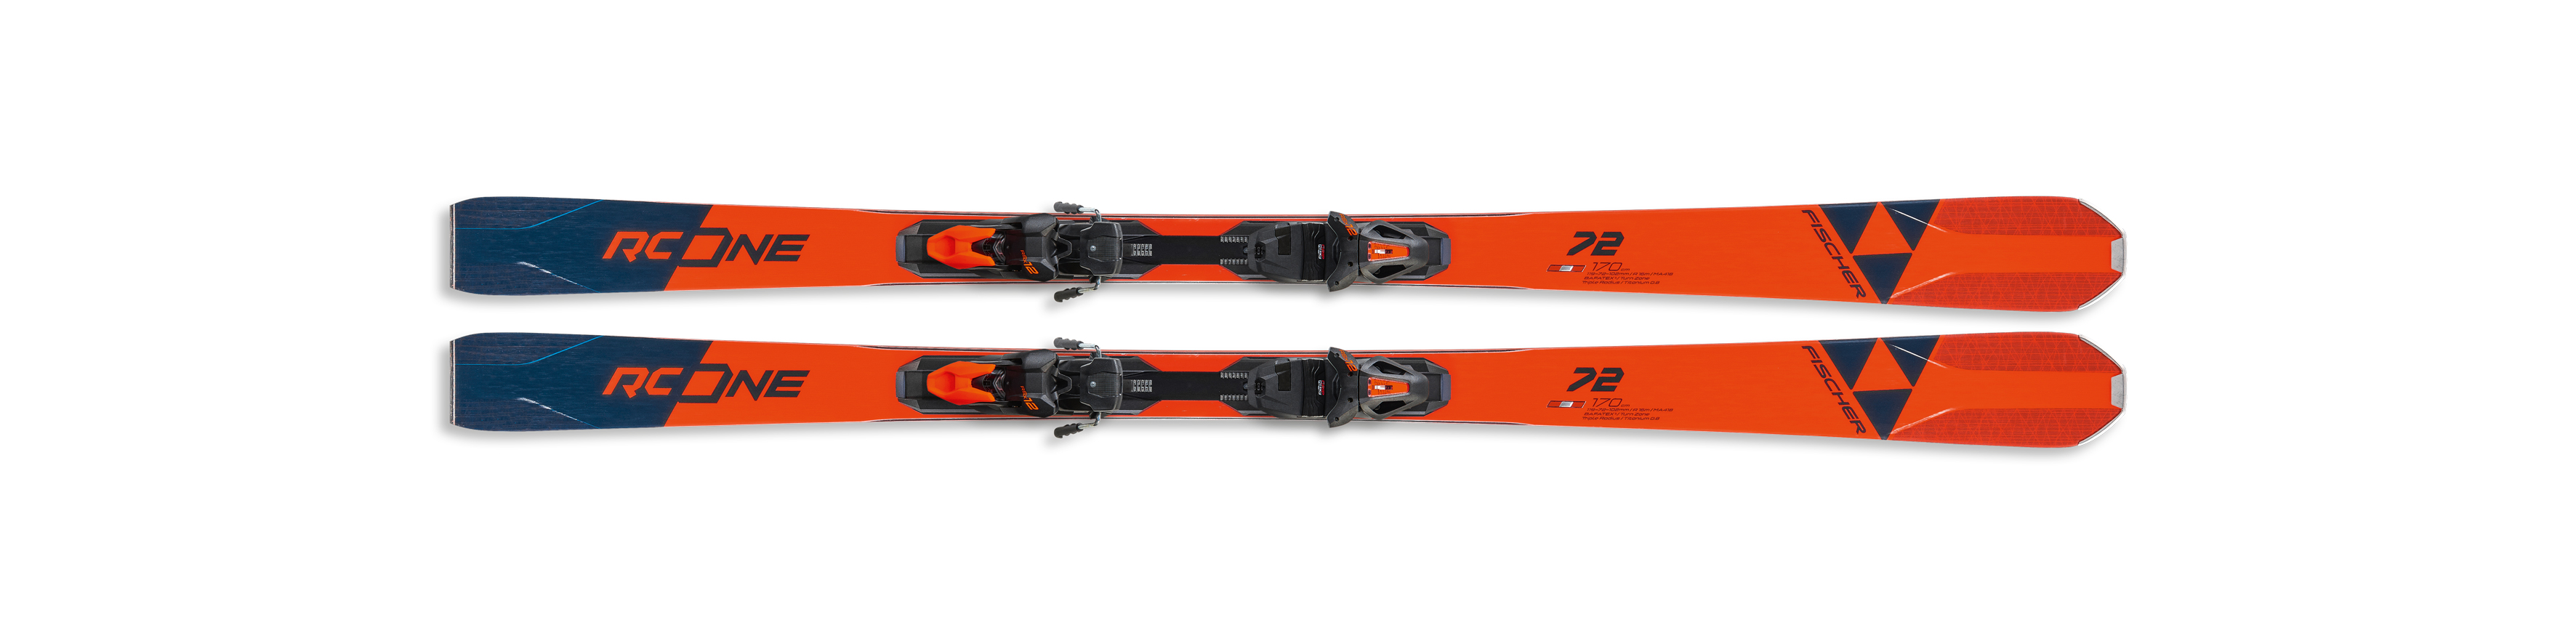 Fischer RC One Turn Poles Black//red